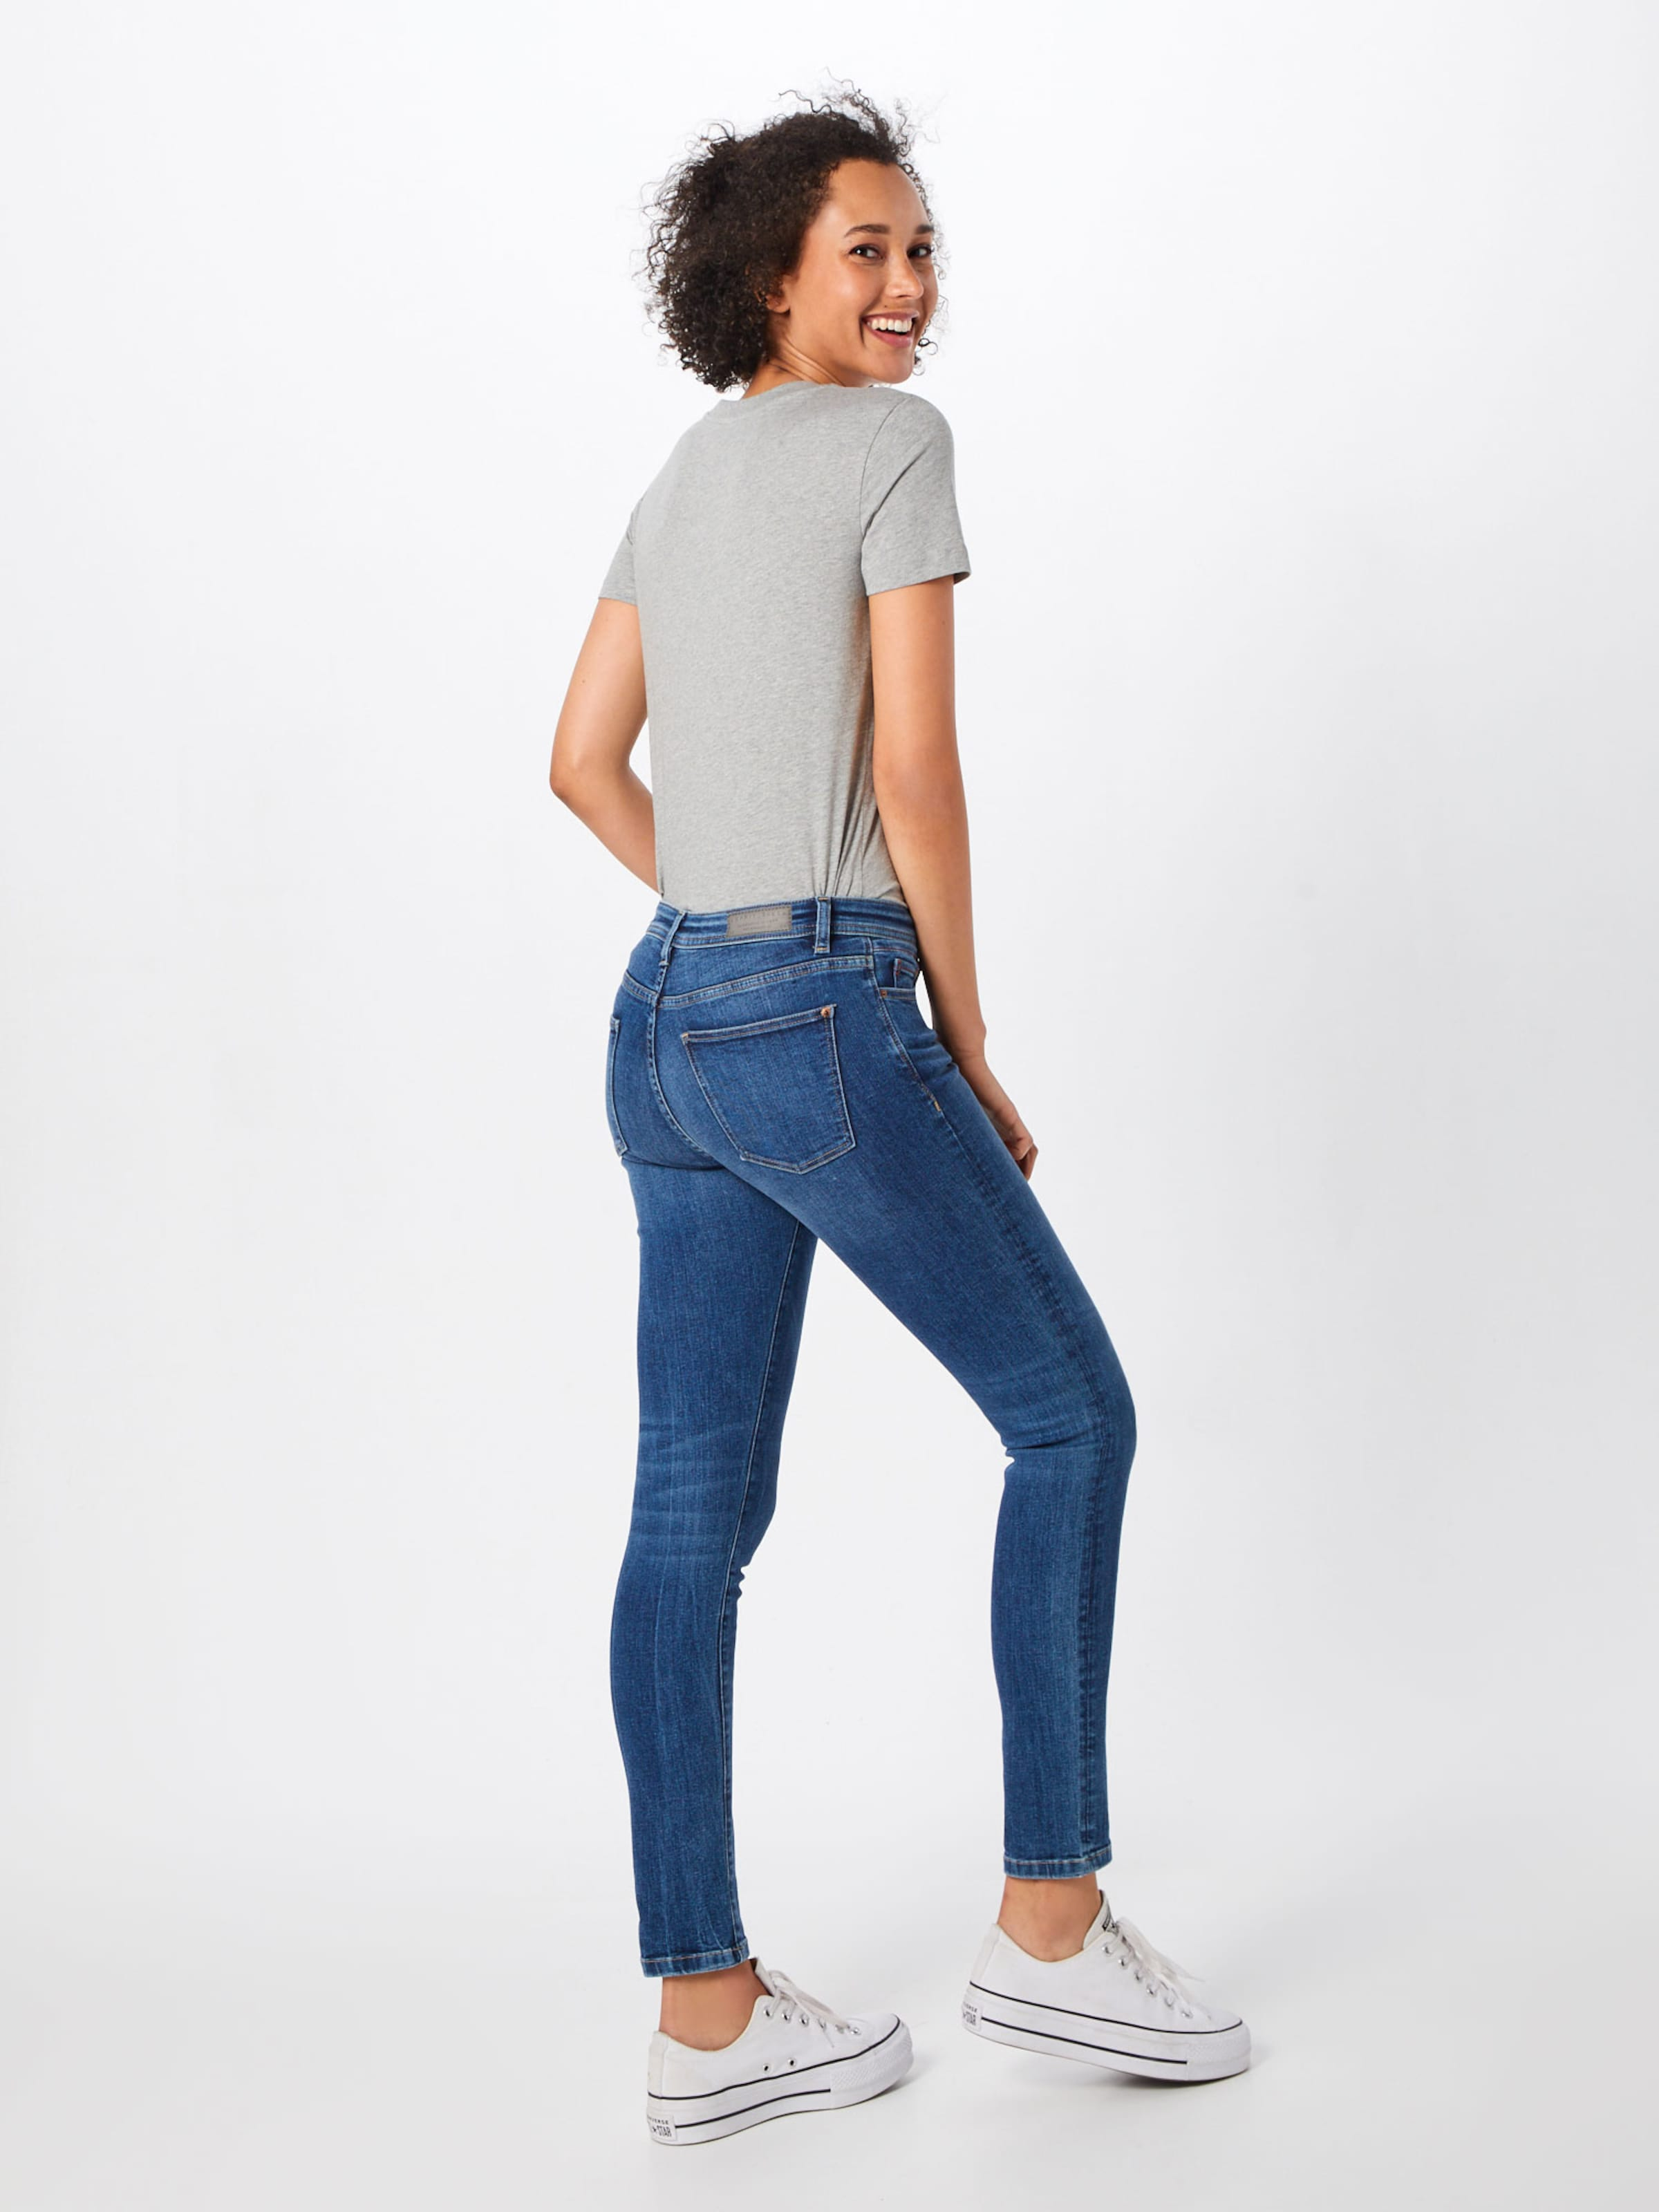 Esprit Jeans 'mr Denim' Slim In Denim Pants Blue eDWIb2E9YH